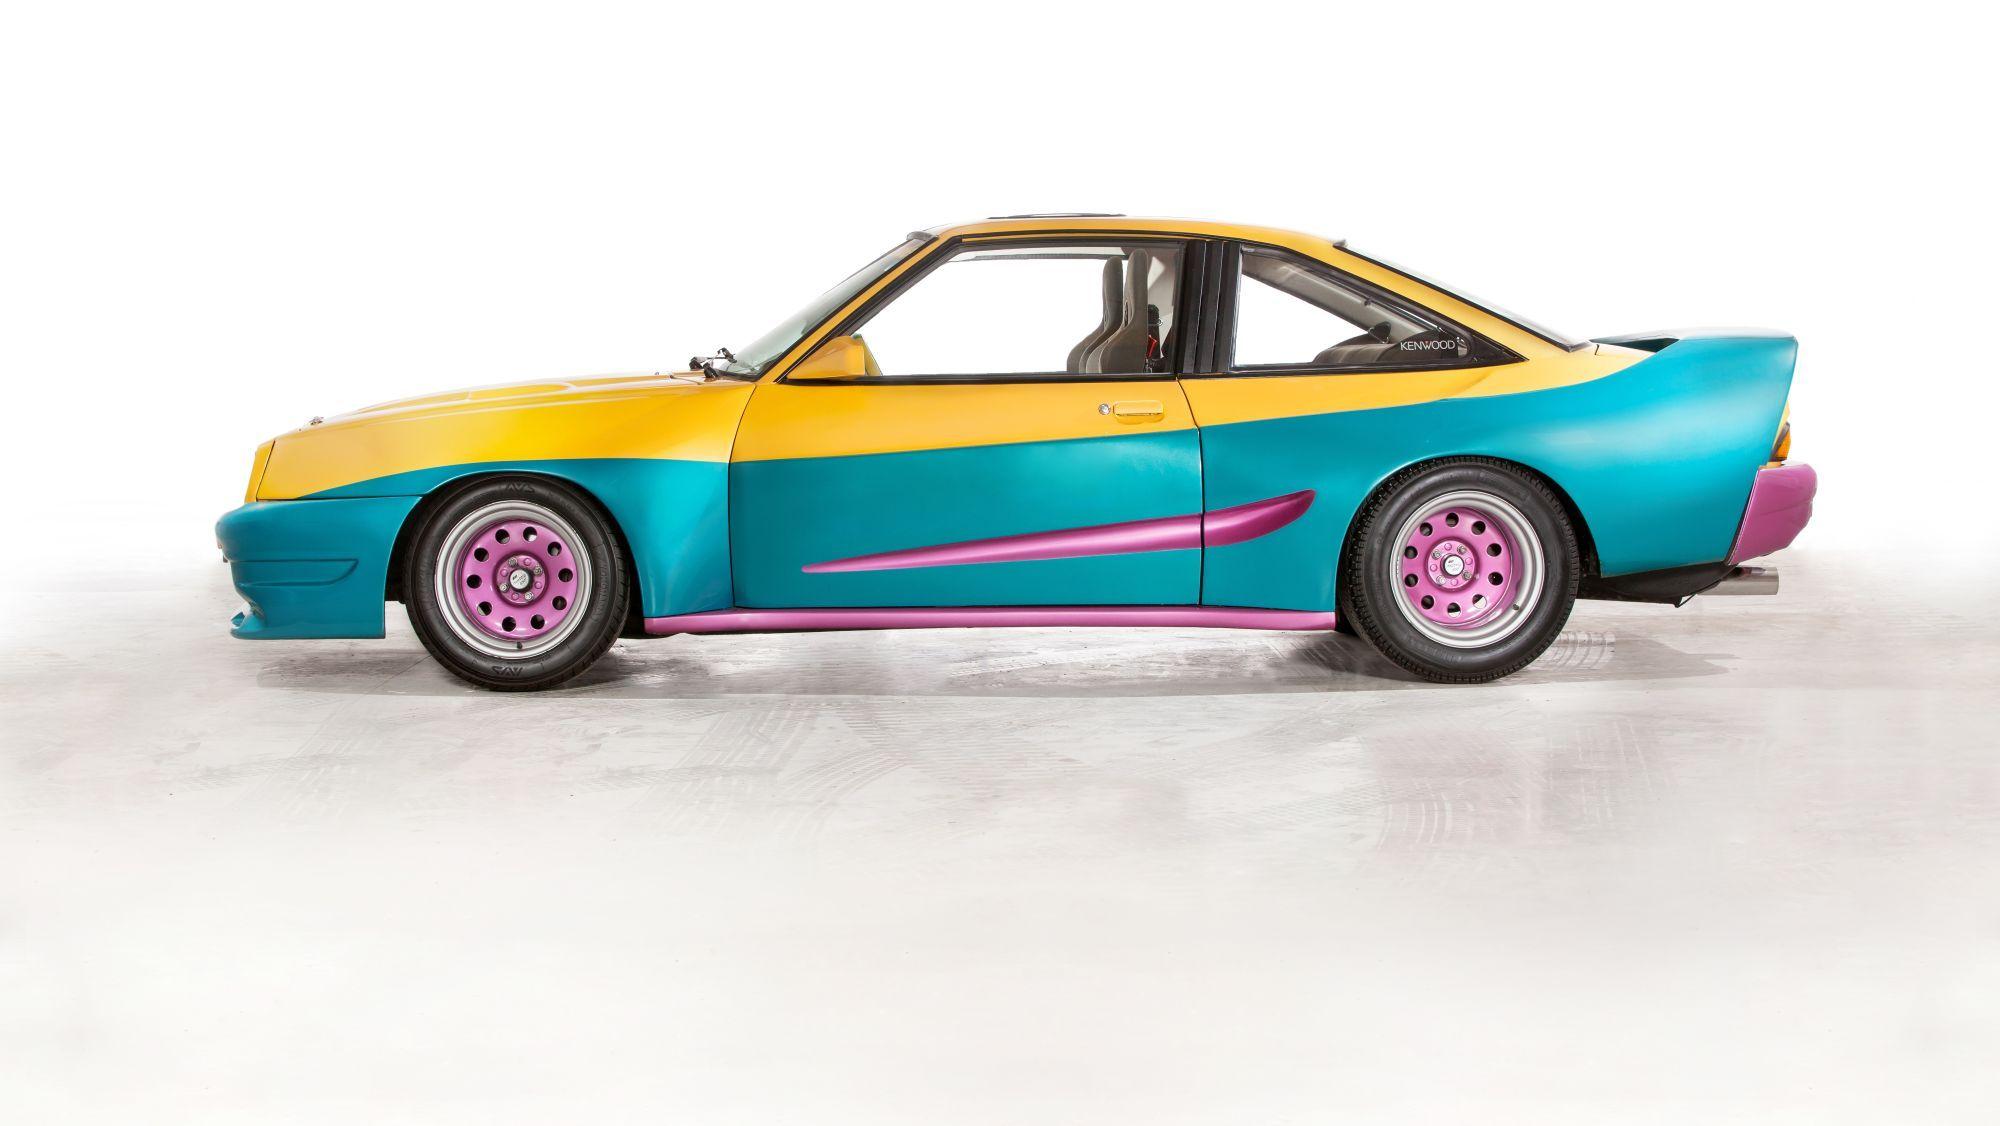 A colourful Opel Manta B